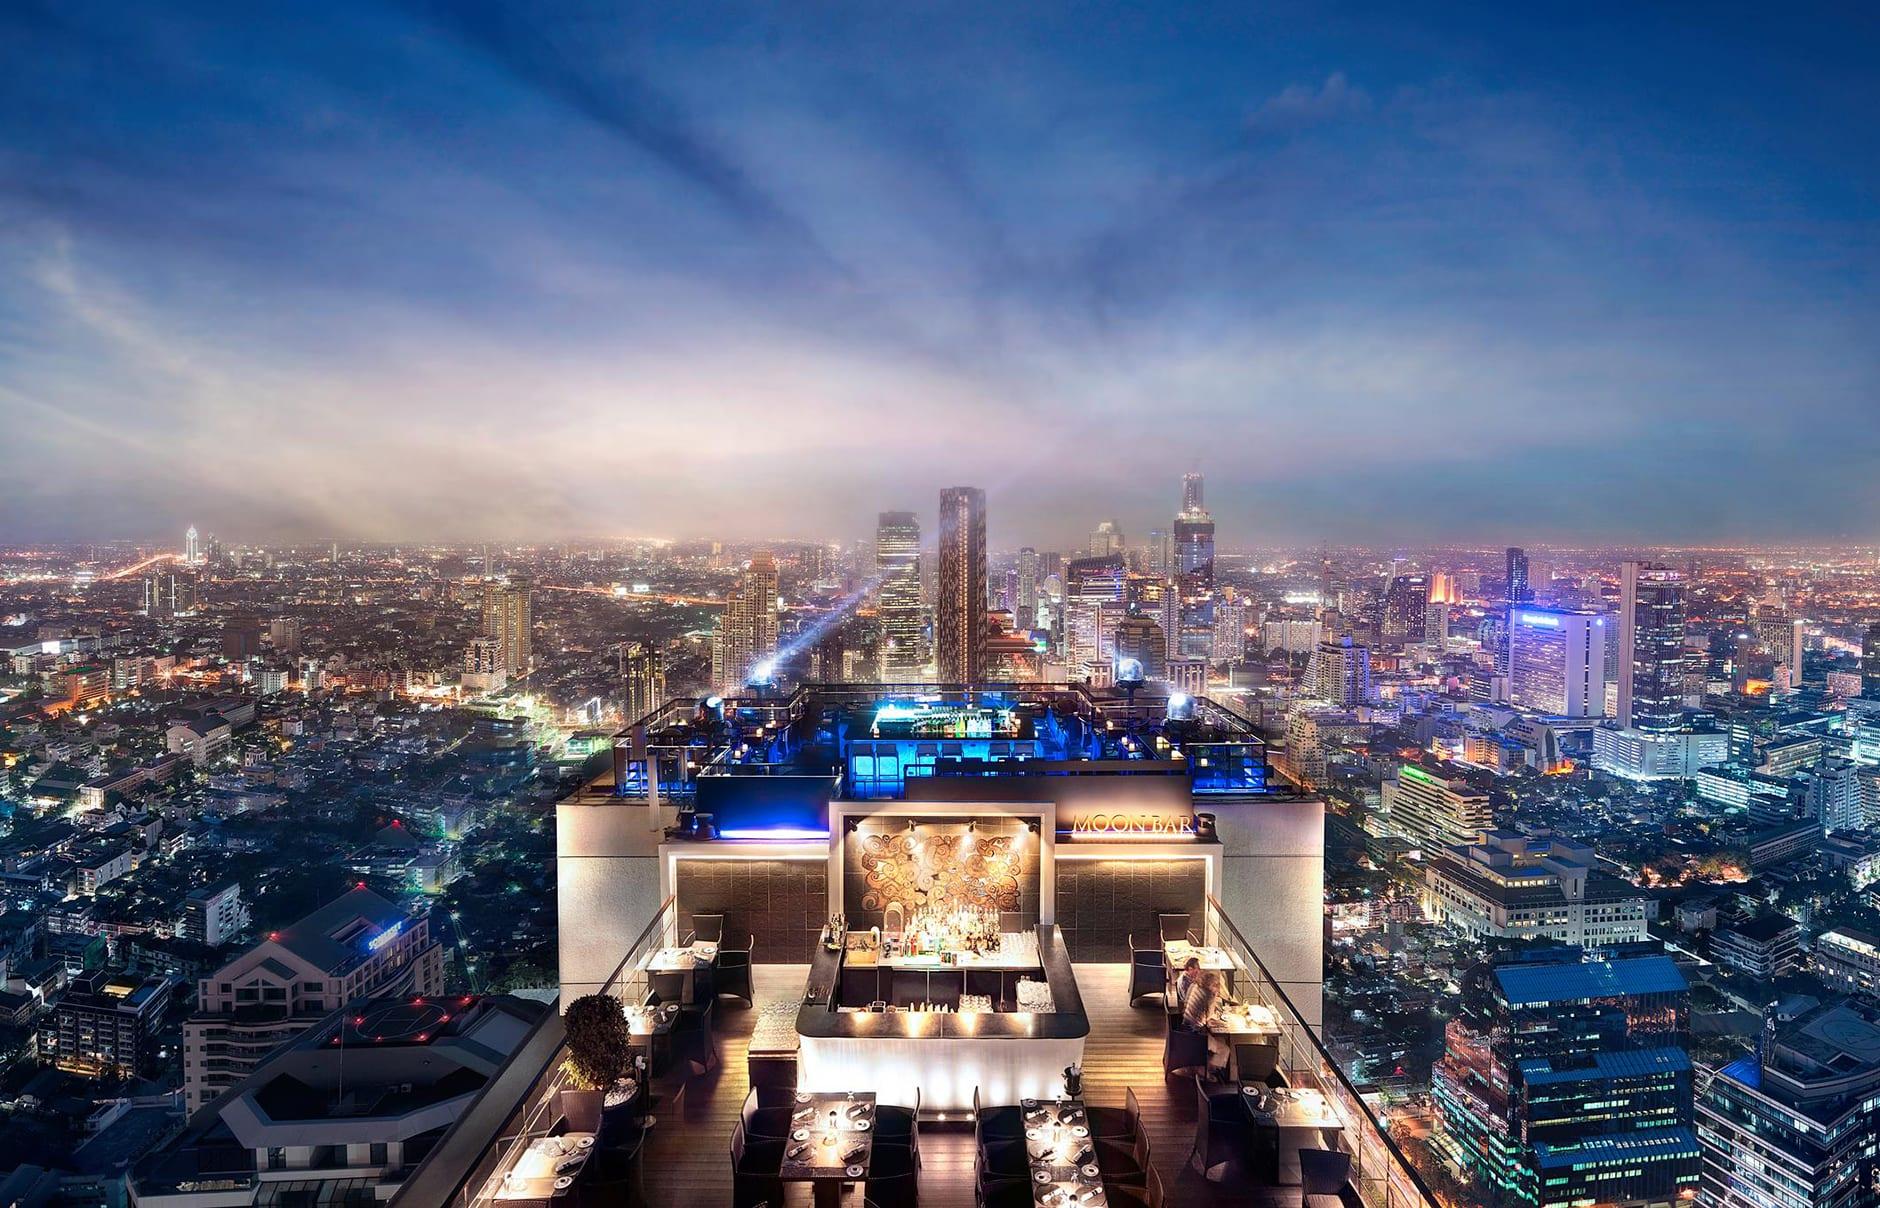 Banyan Tree Bangkok, Thailand. Hotel Review by TravelPlusStyle. Photo © Banyan Tree Hotels & Resorts